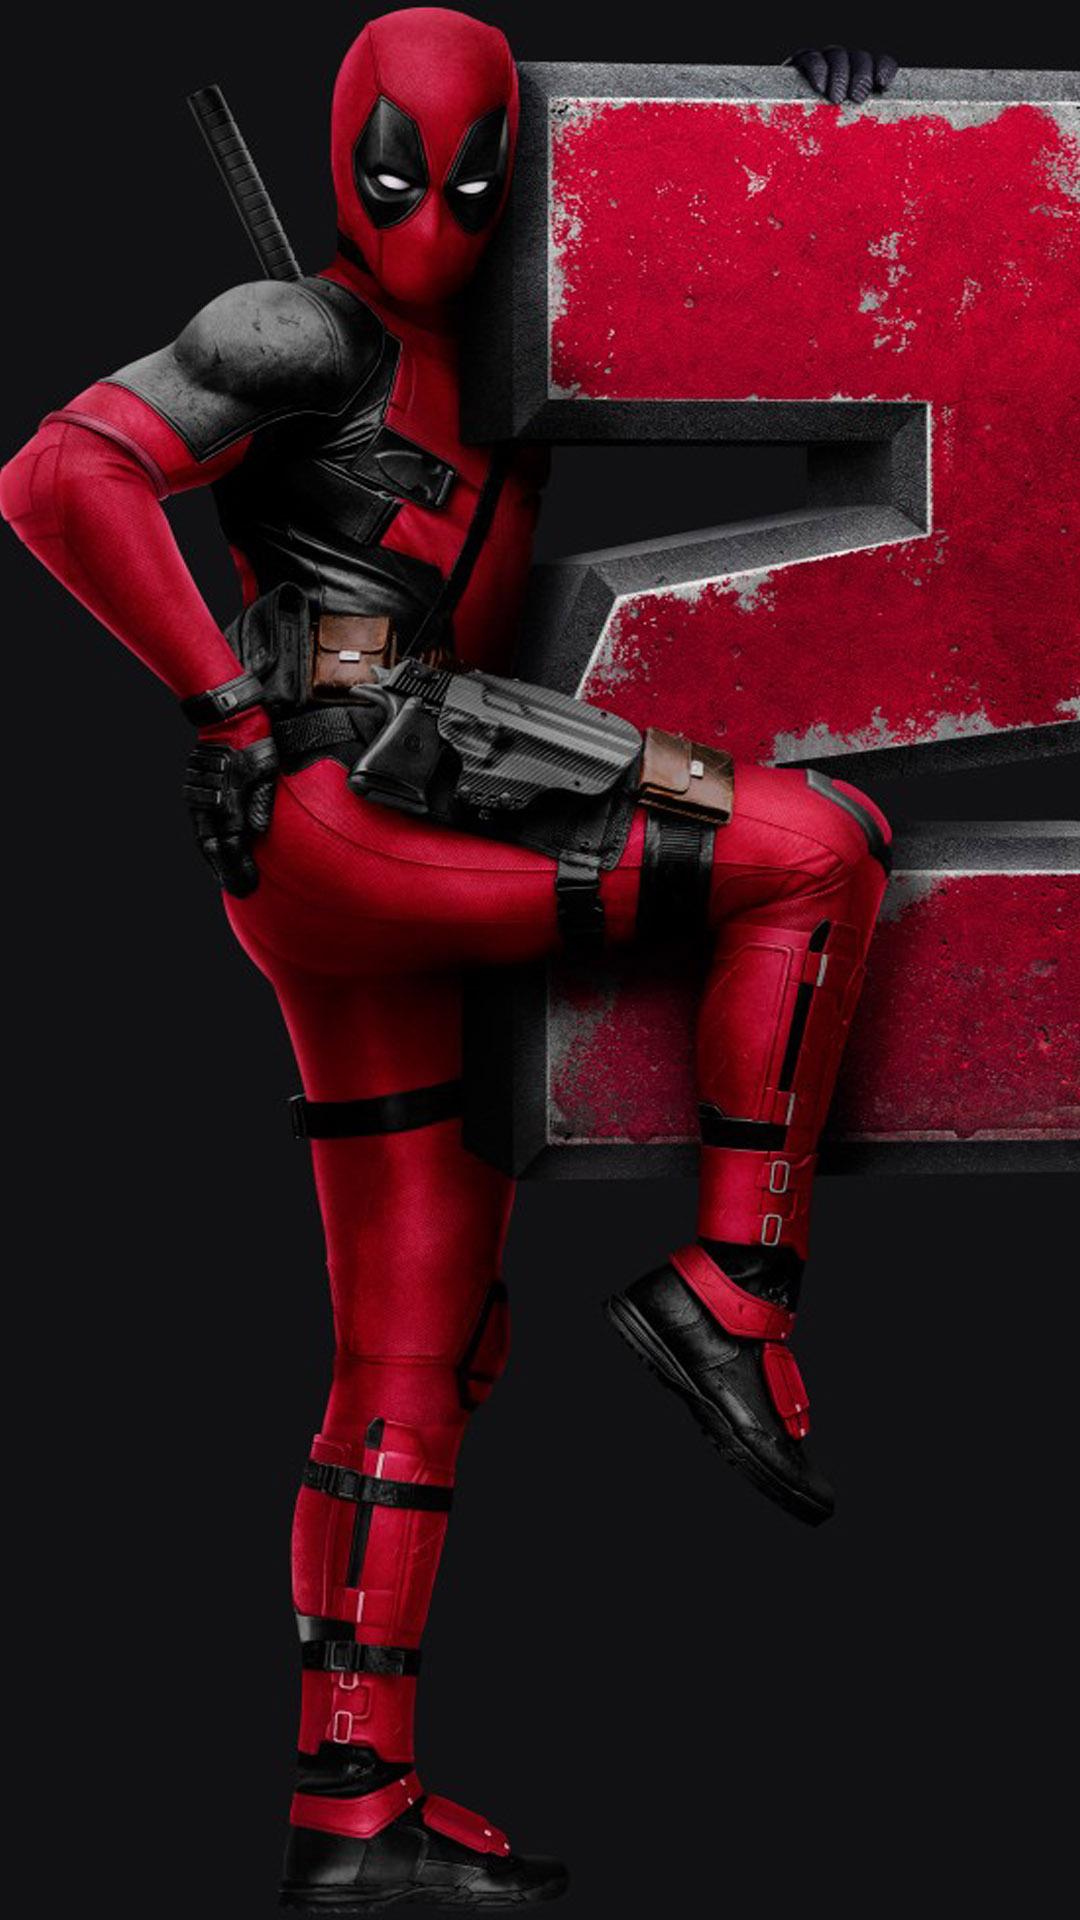 Deadpool 2 Poster Free 4K Ultra HD Mobile Wallpaper